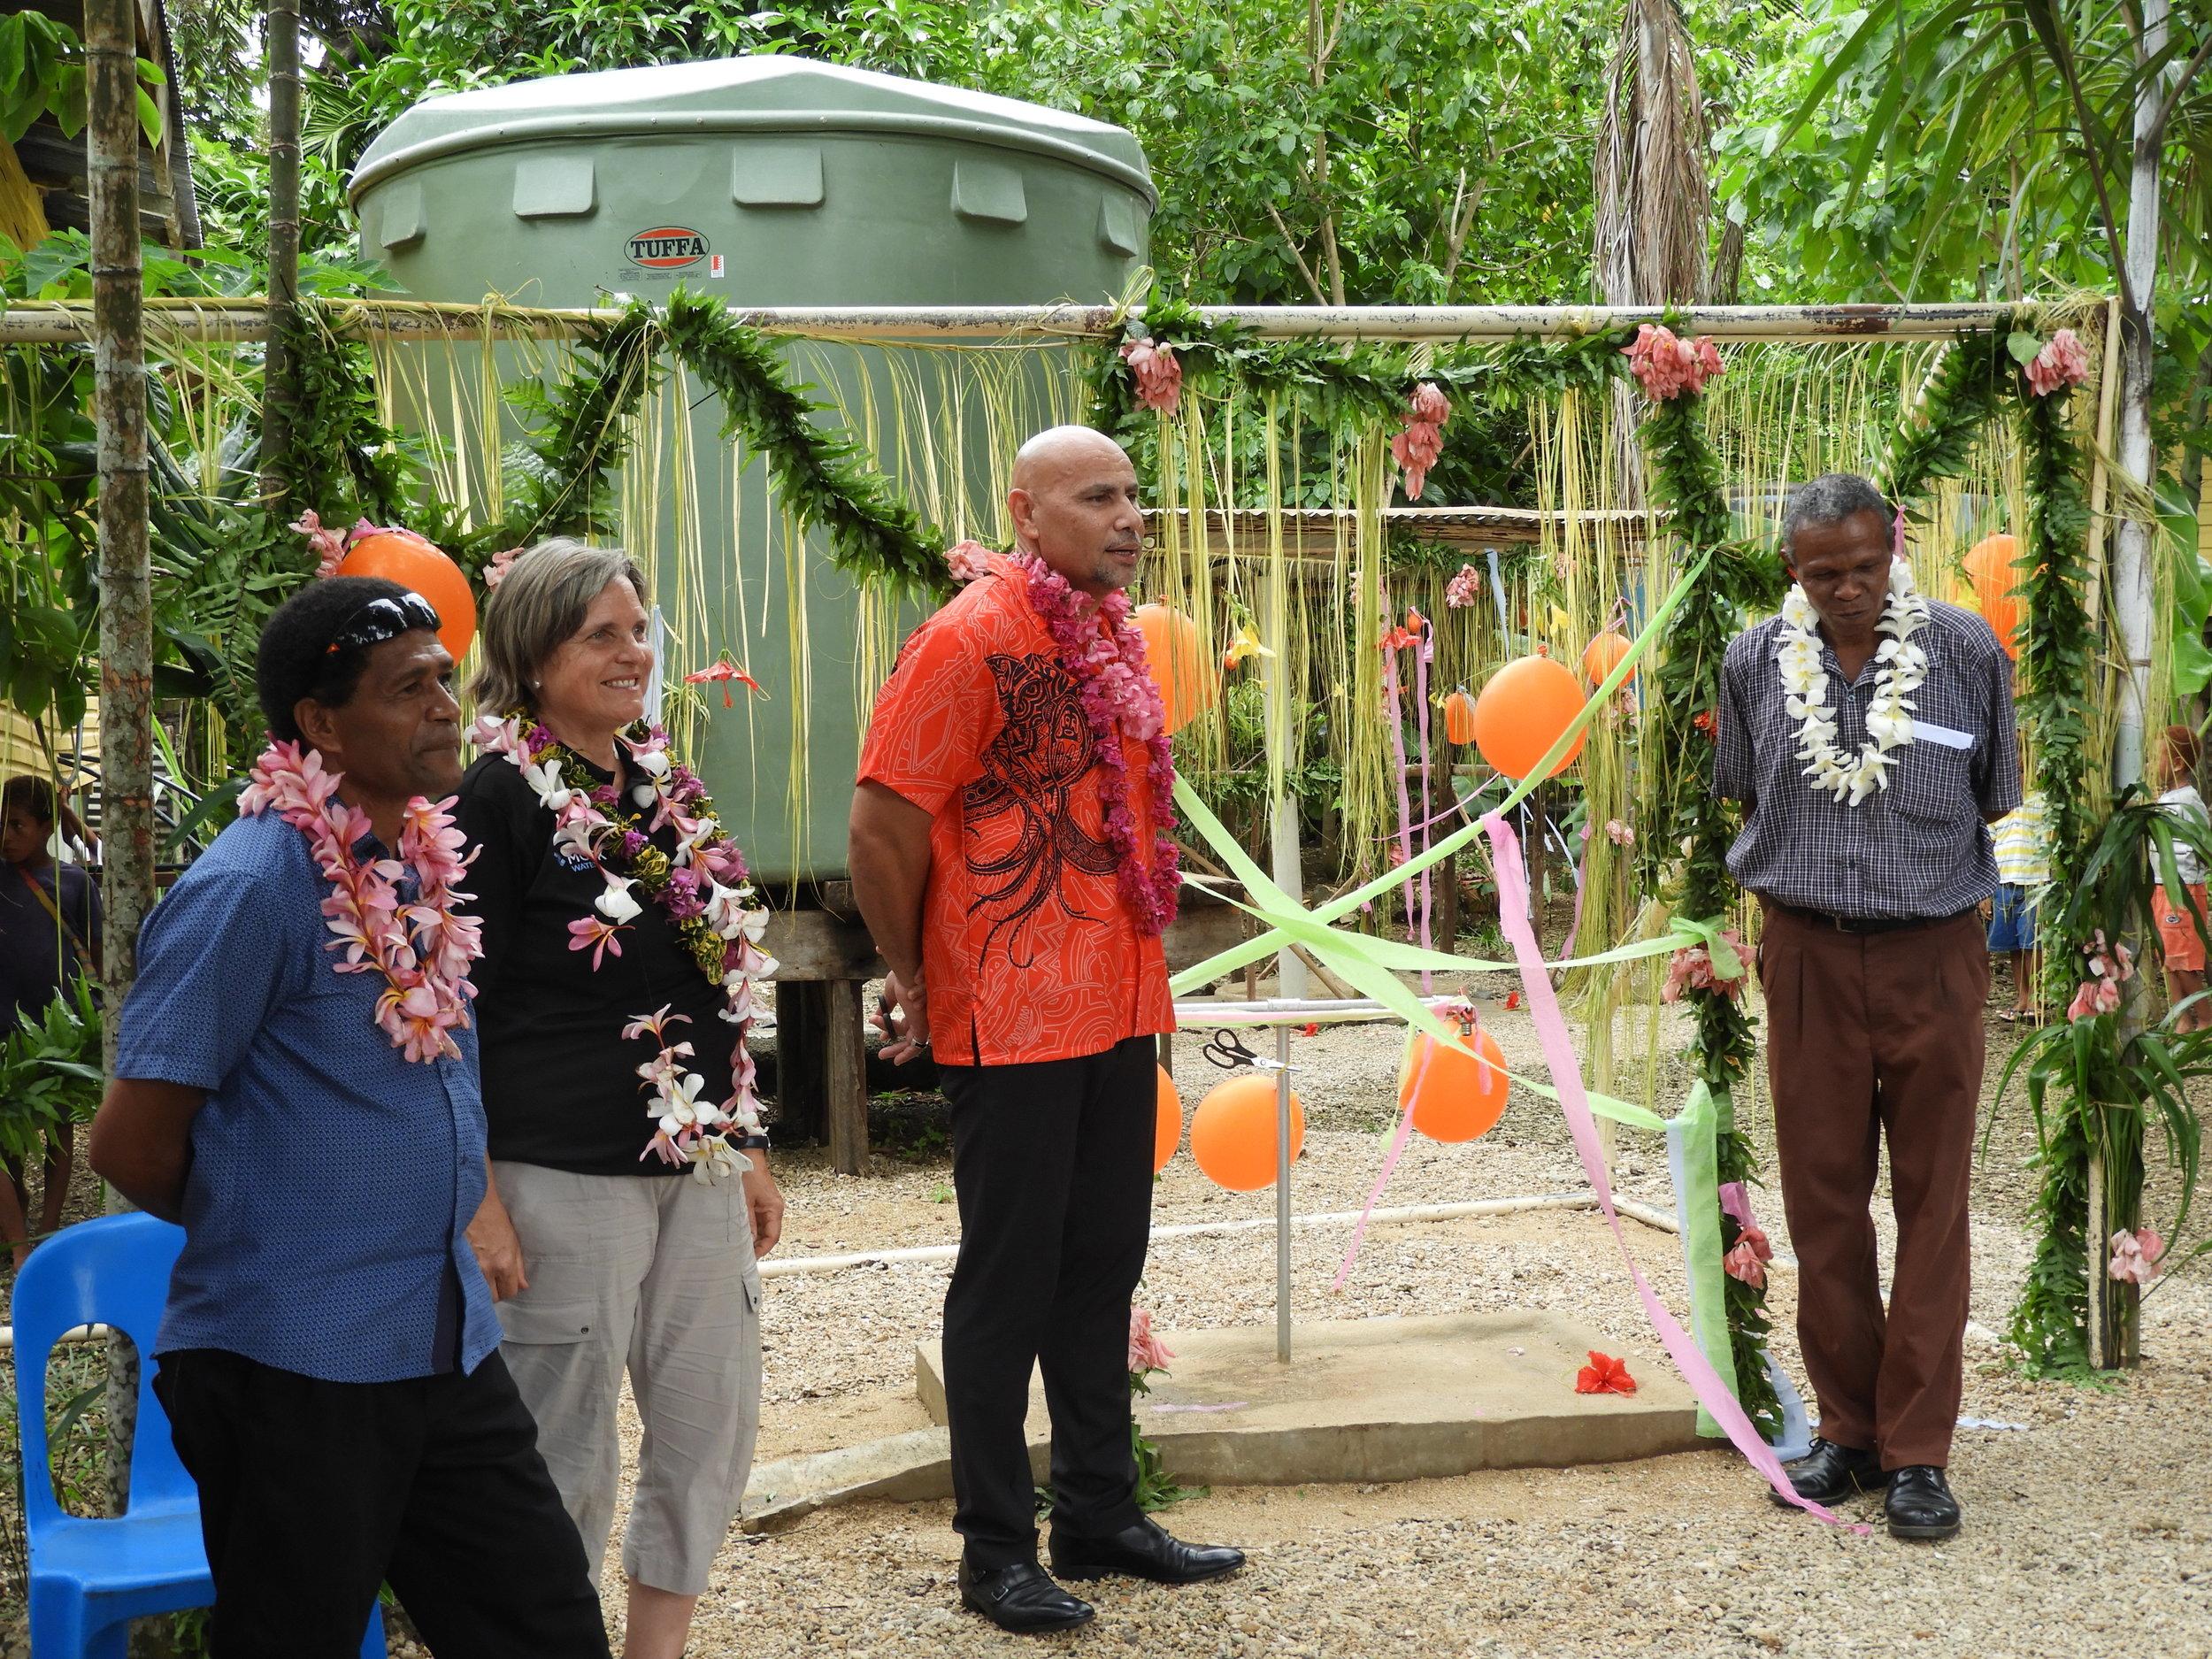 Administrator Mr Lindsay Alesana, Moerk Water Business Director Barbara Brezger, Deputy Prime Minister Hon. Charles Abel MP, President Maramatana LLG Hon. James Rubeni (From left to right).